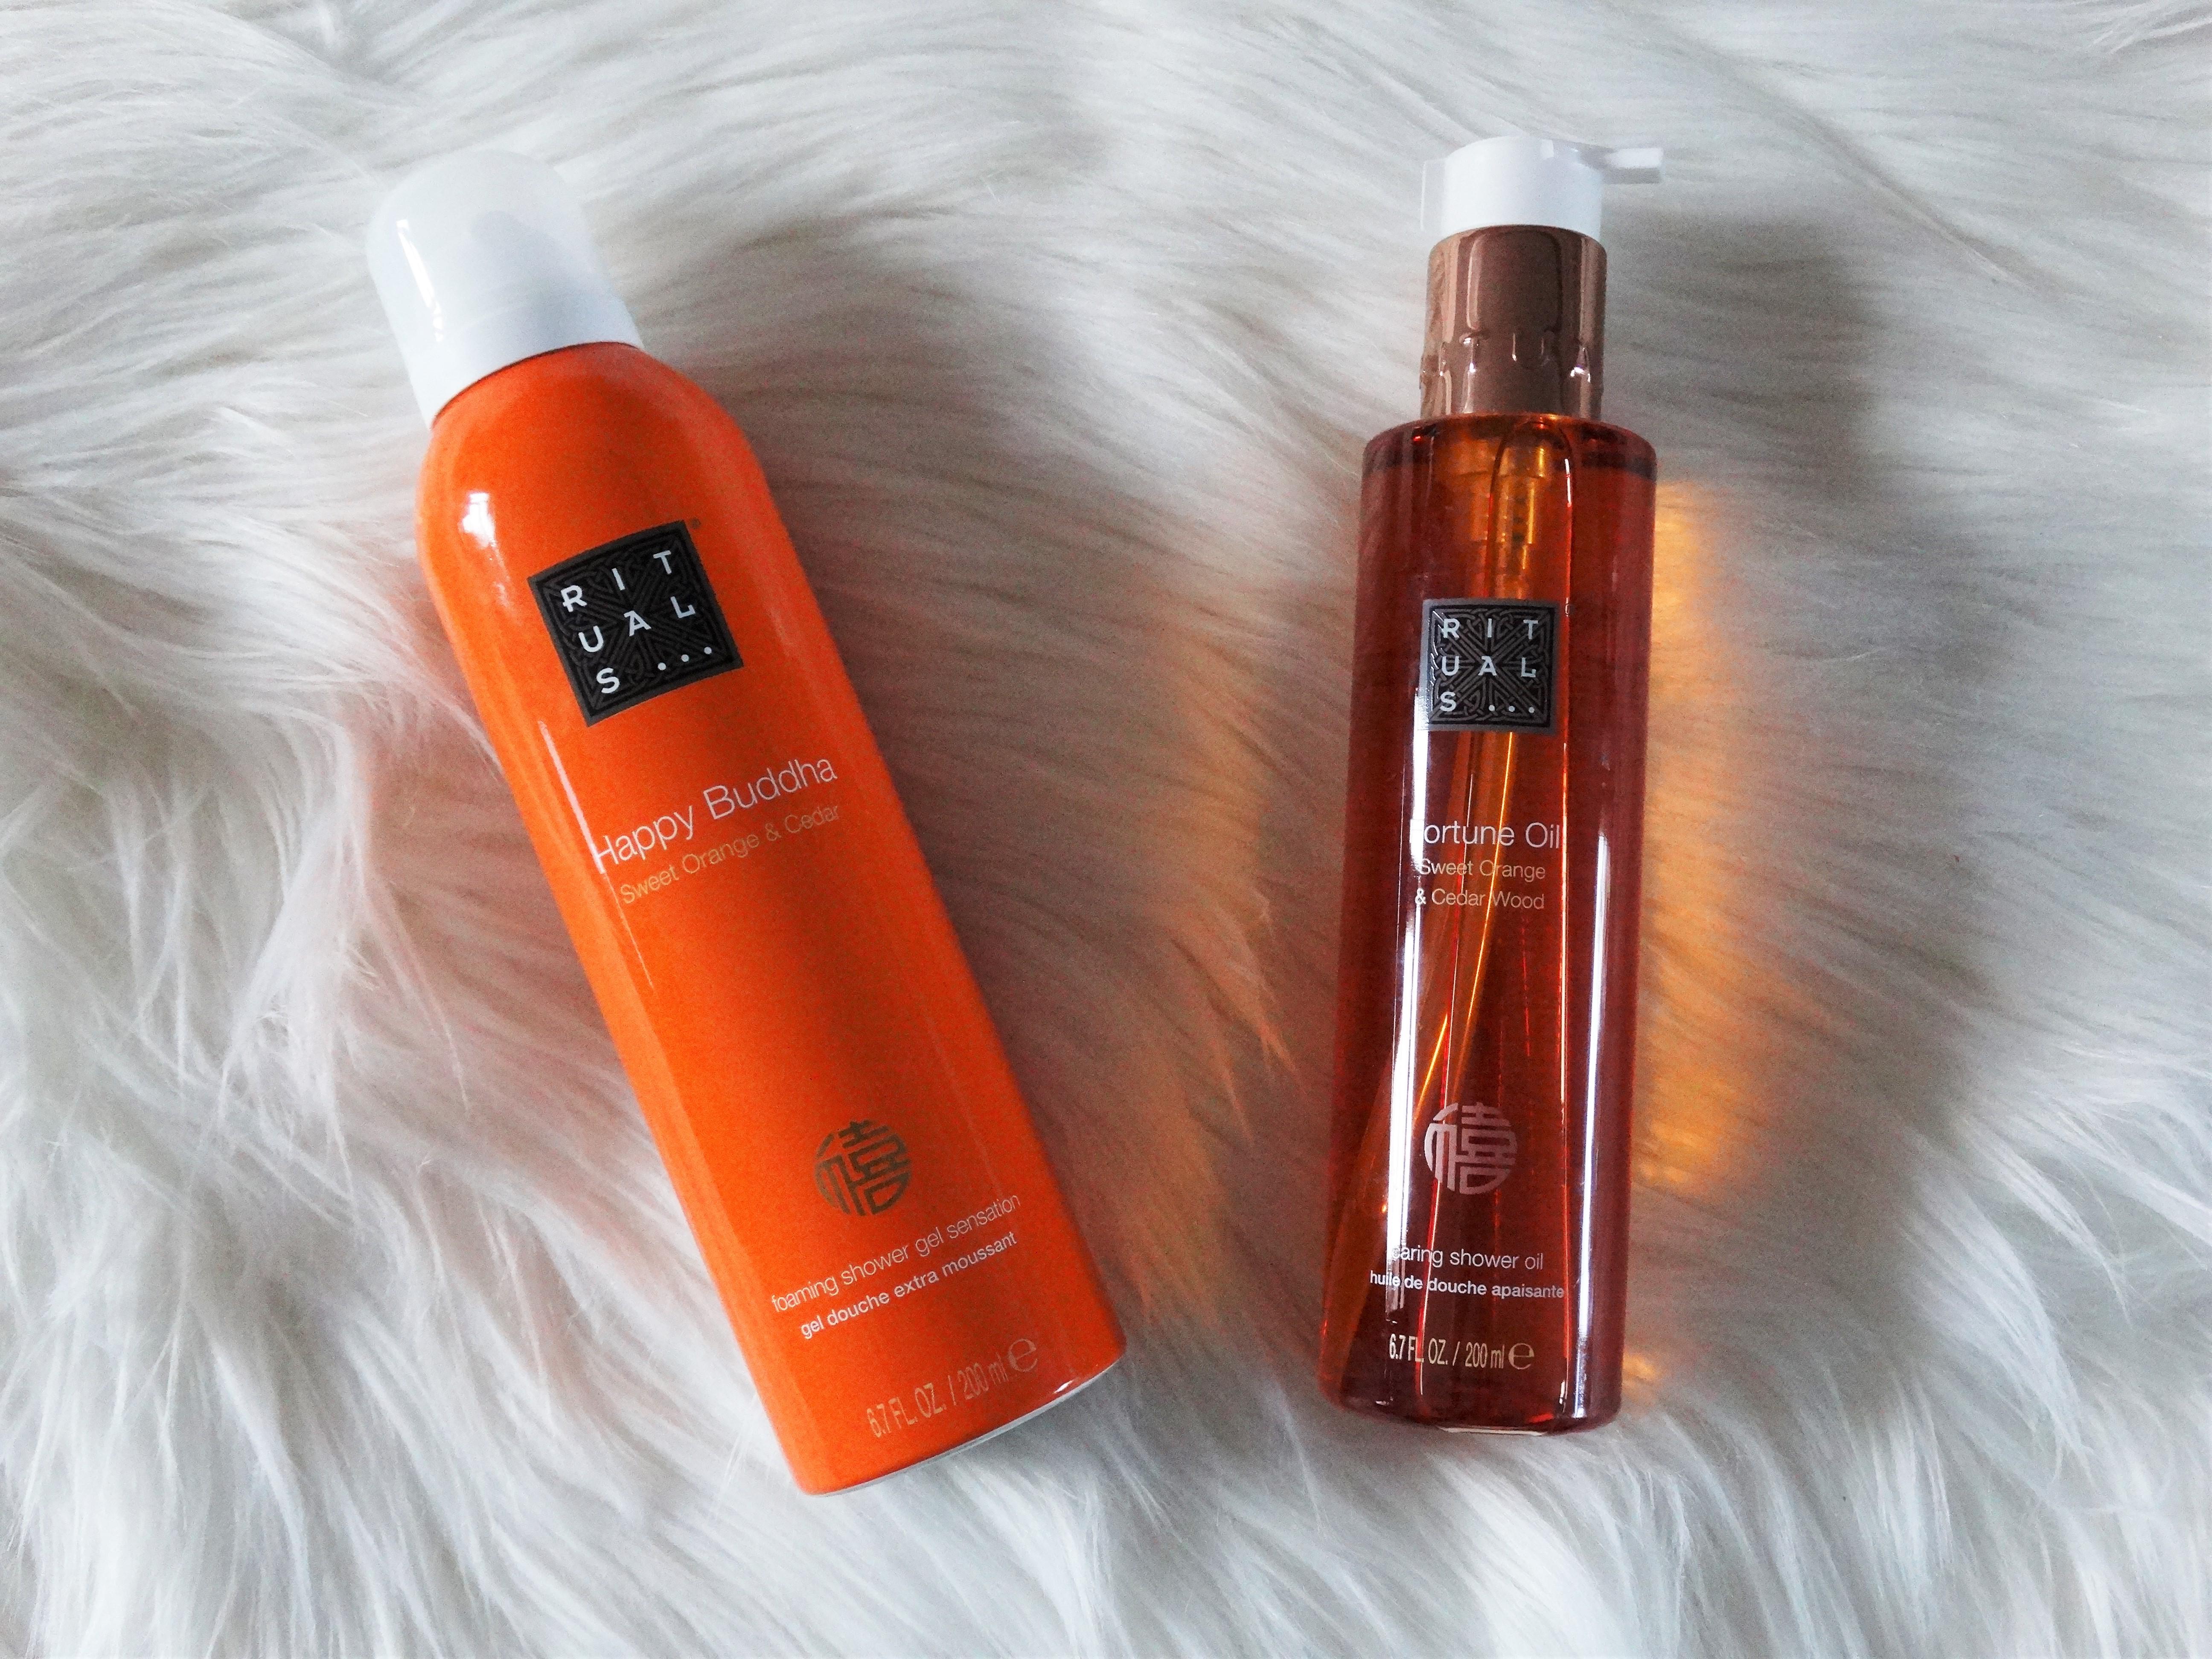 New in: Rituals sweet orange & cedar